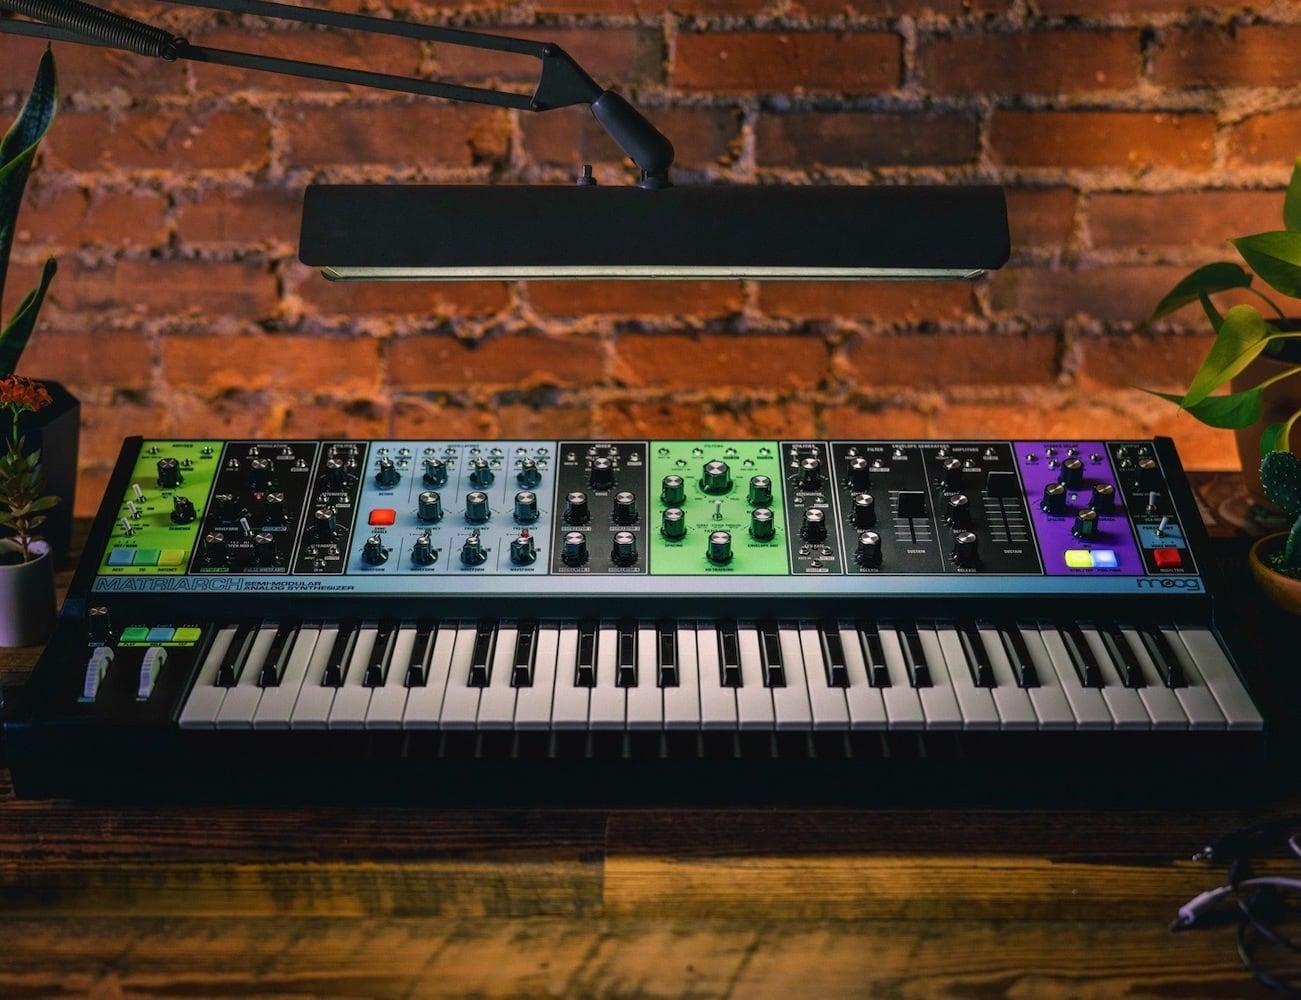 Moog Matriarch Semi-Modular Analog Synthesizer gives you incredible analog sound